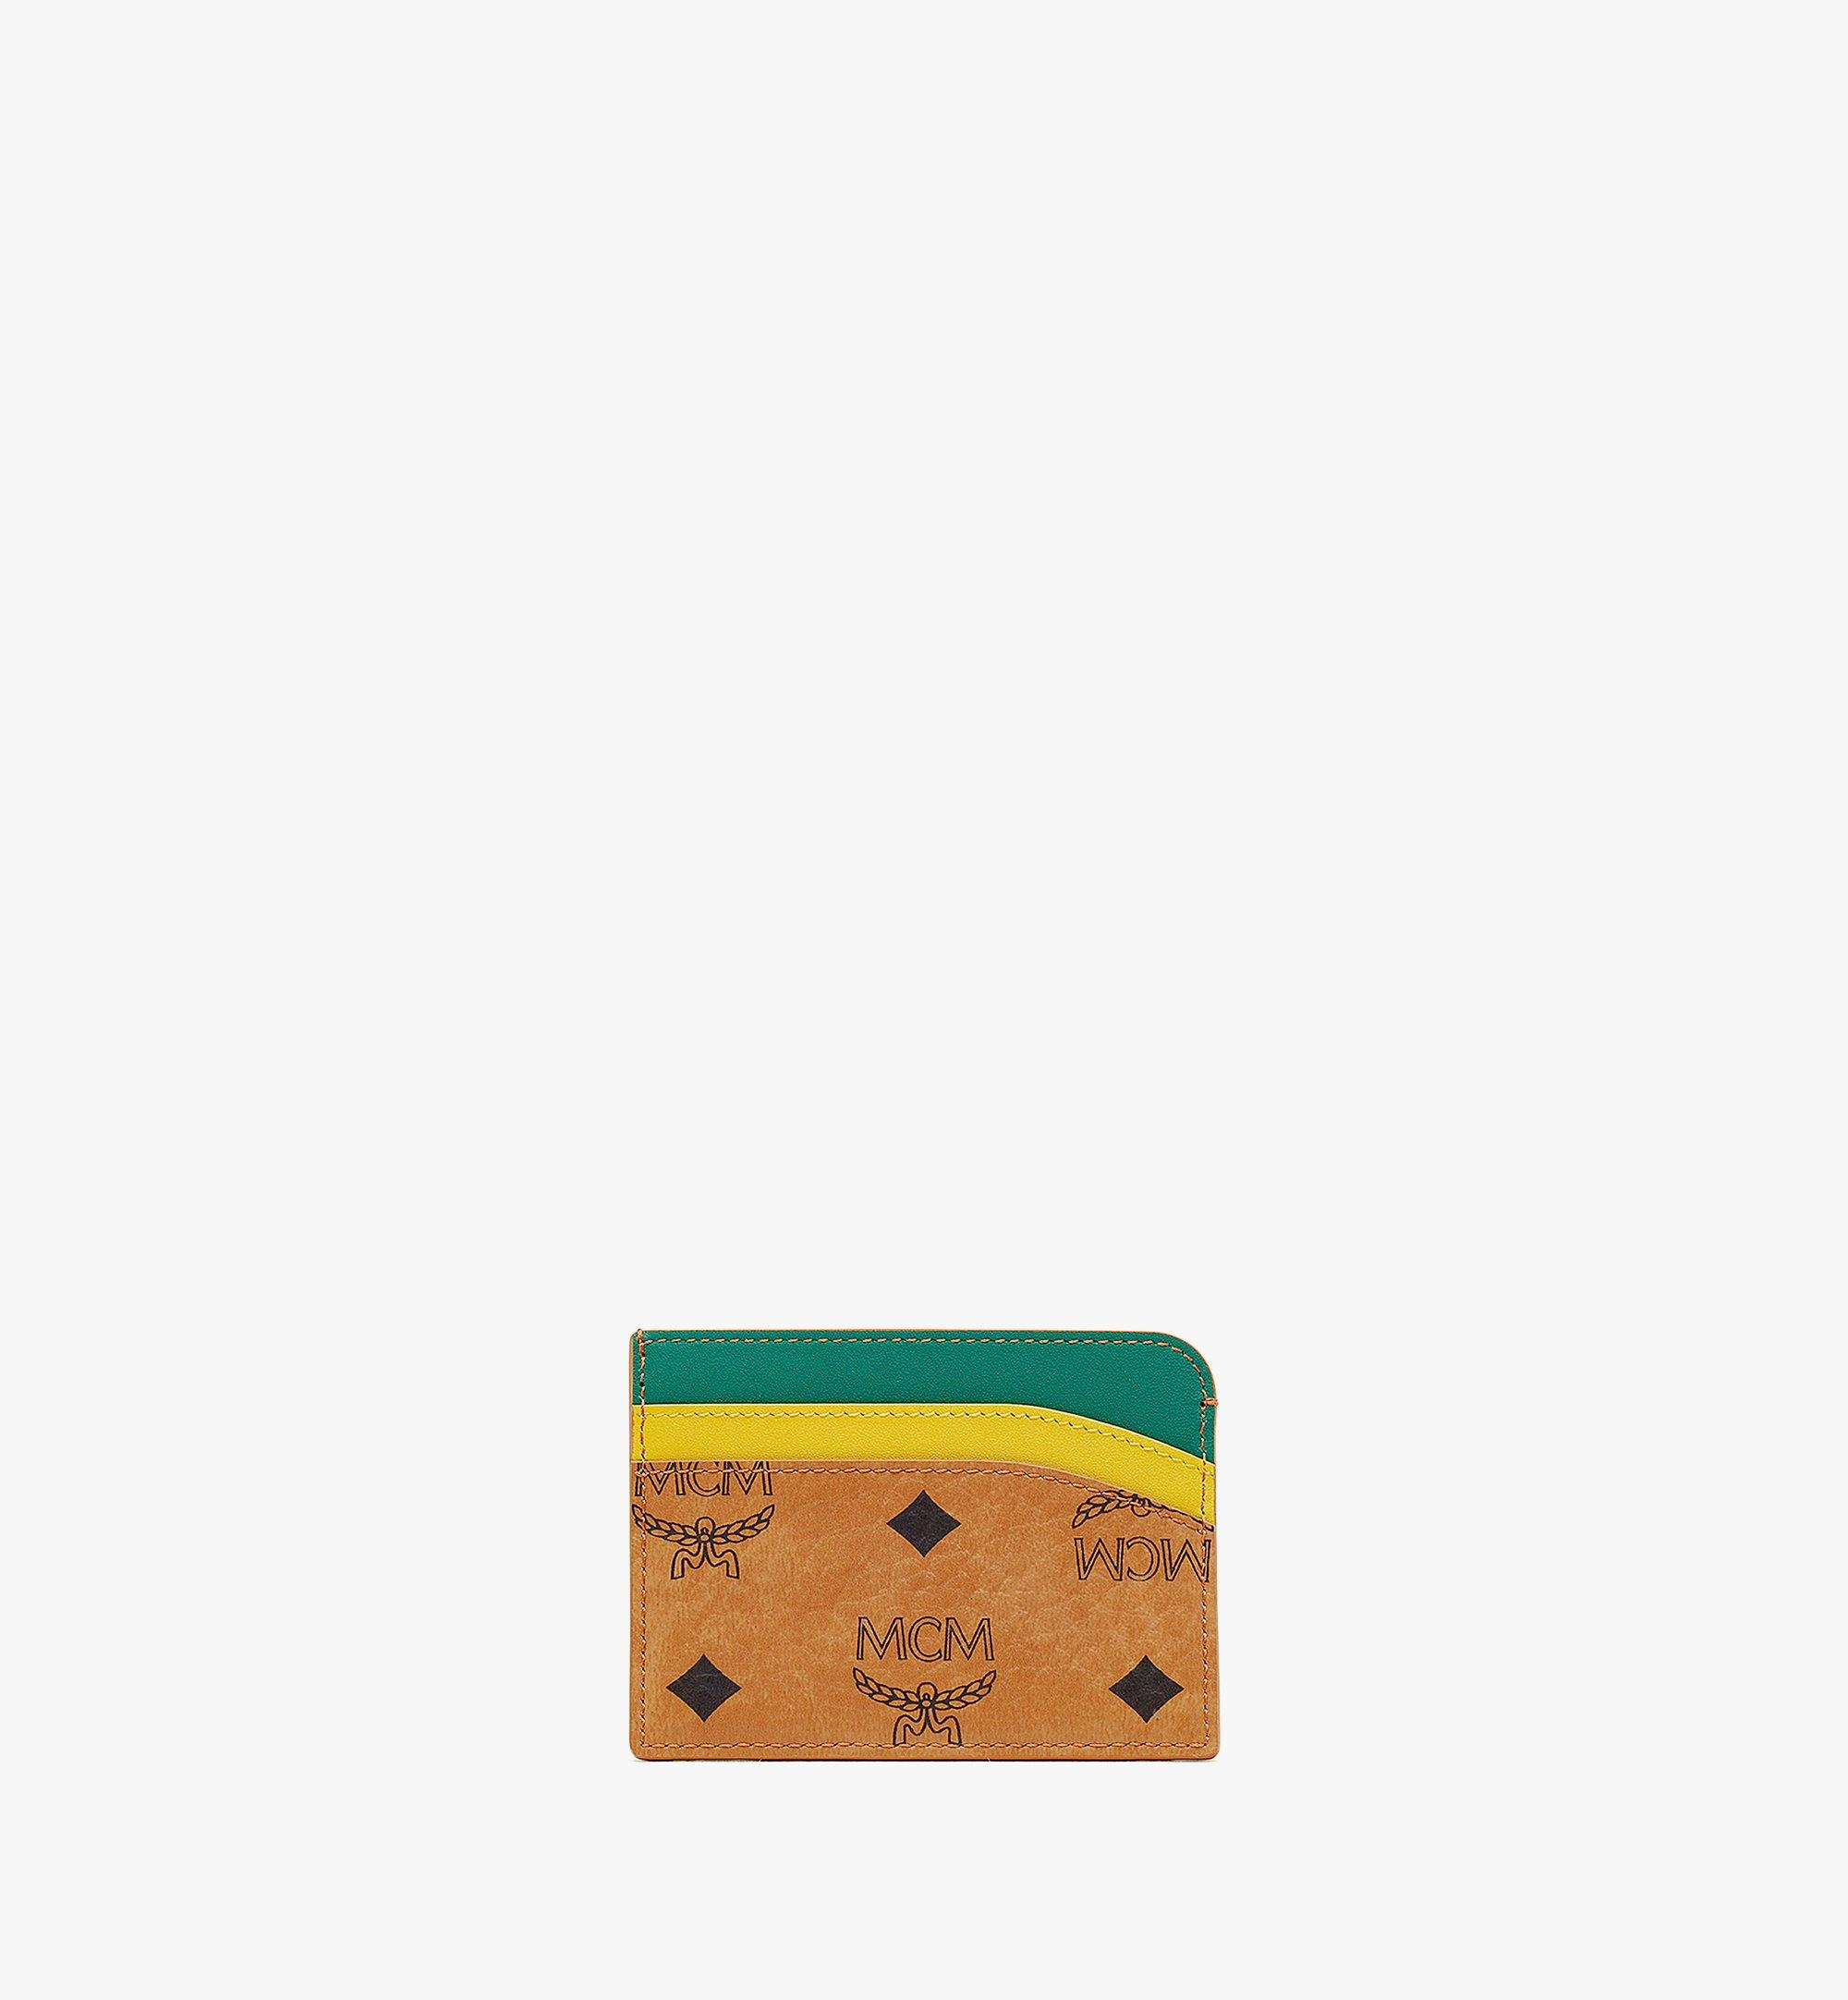 MCM MCM Zoo Crocodile Card Case in Visetos Leather Mix Cognac MXABSXL02CO001 Alternate View 2